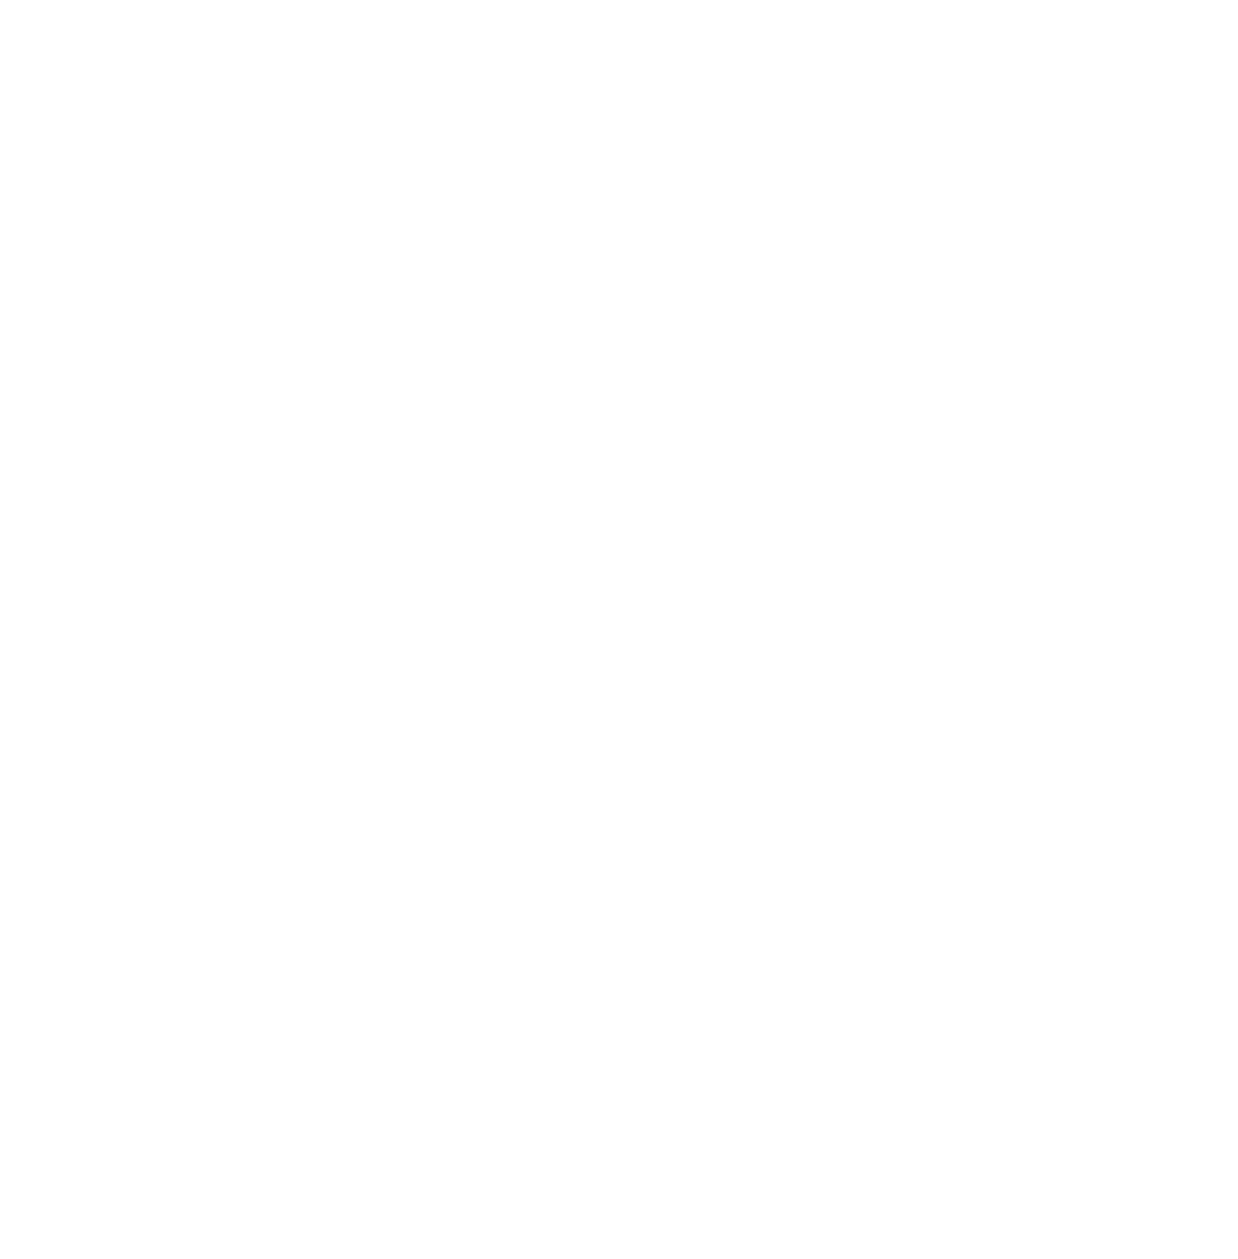 linn-dark-11